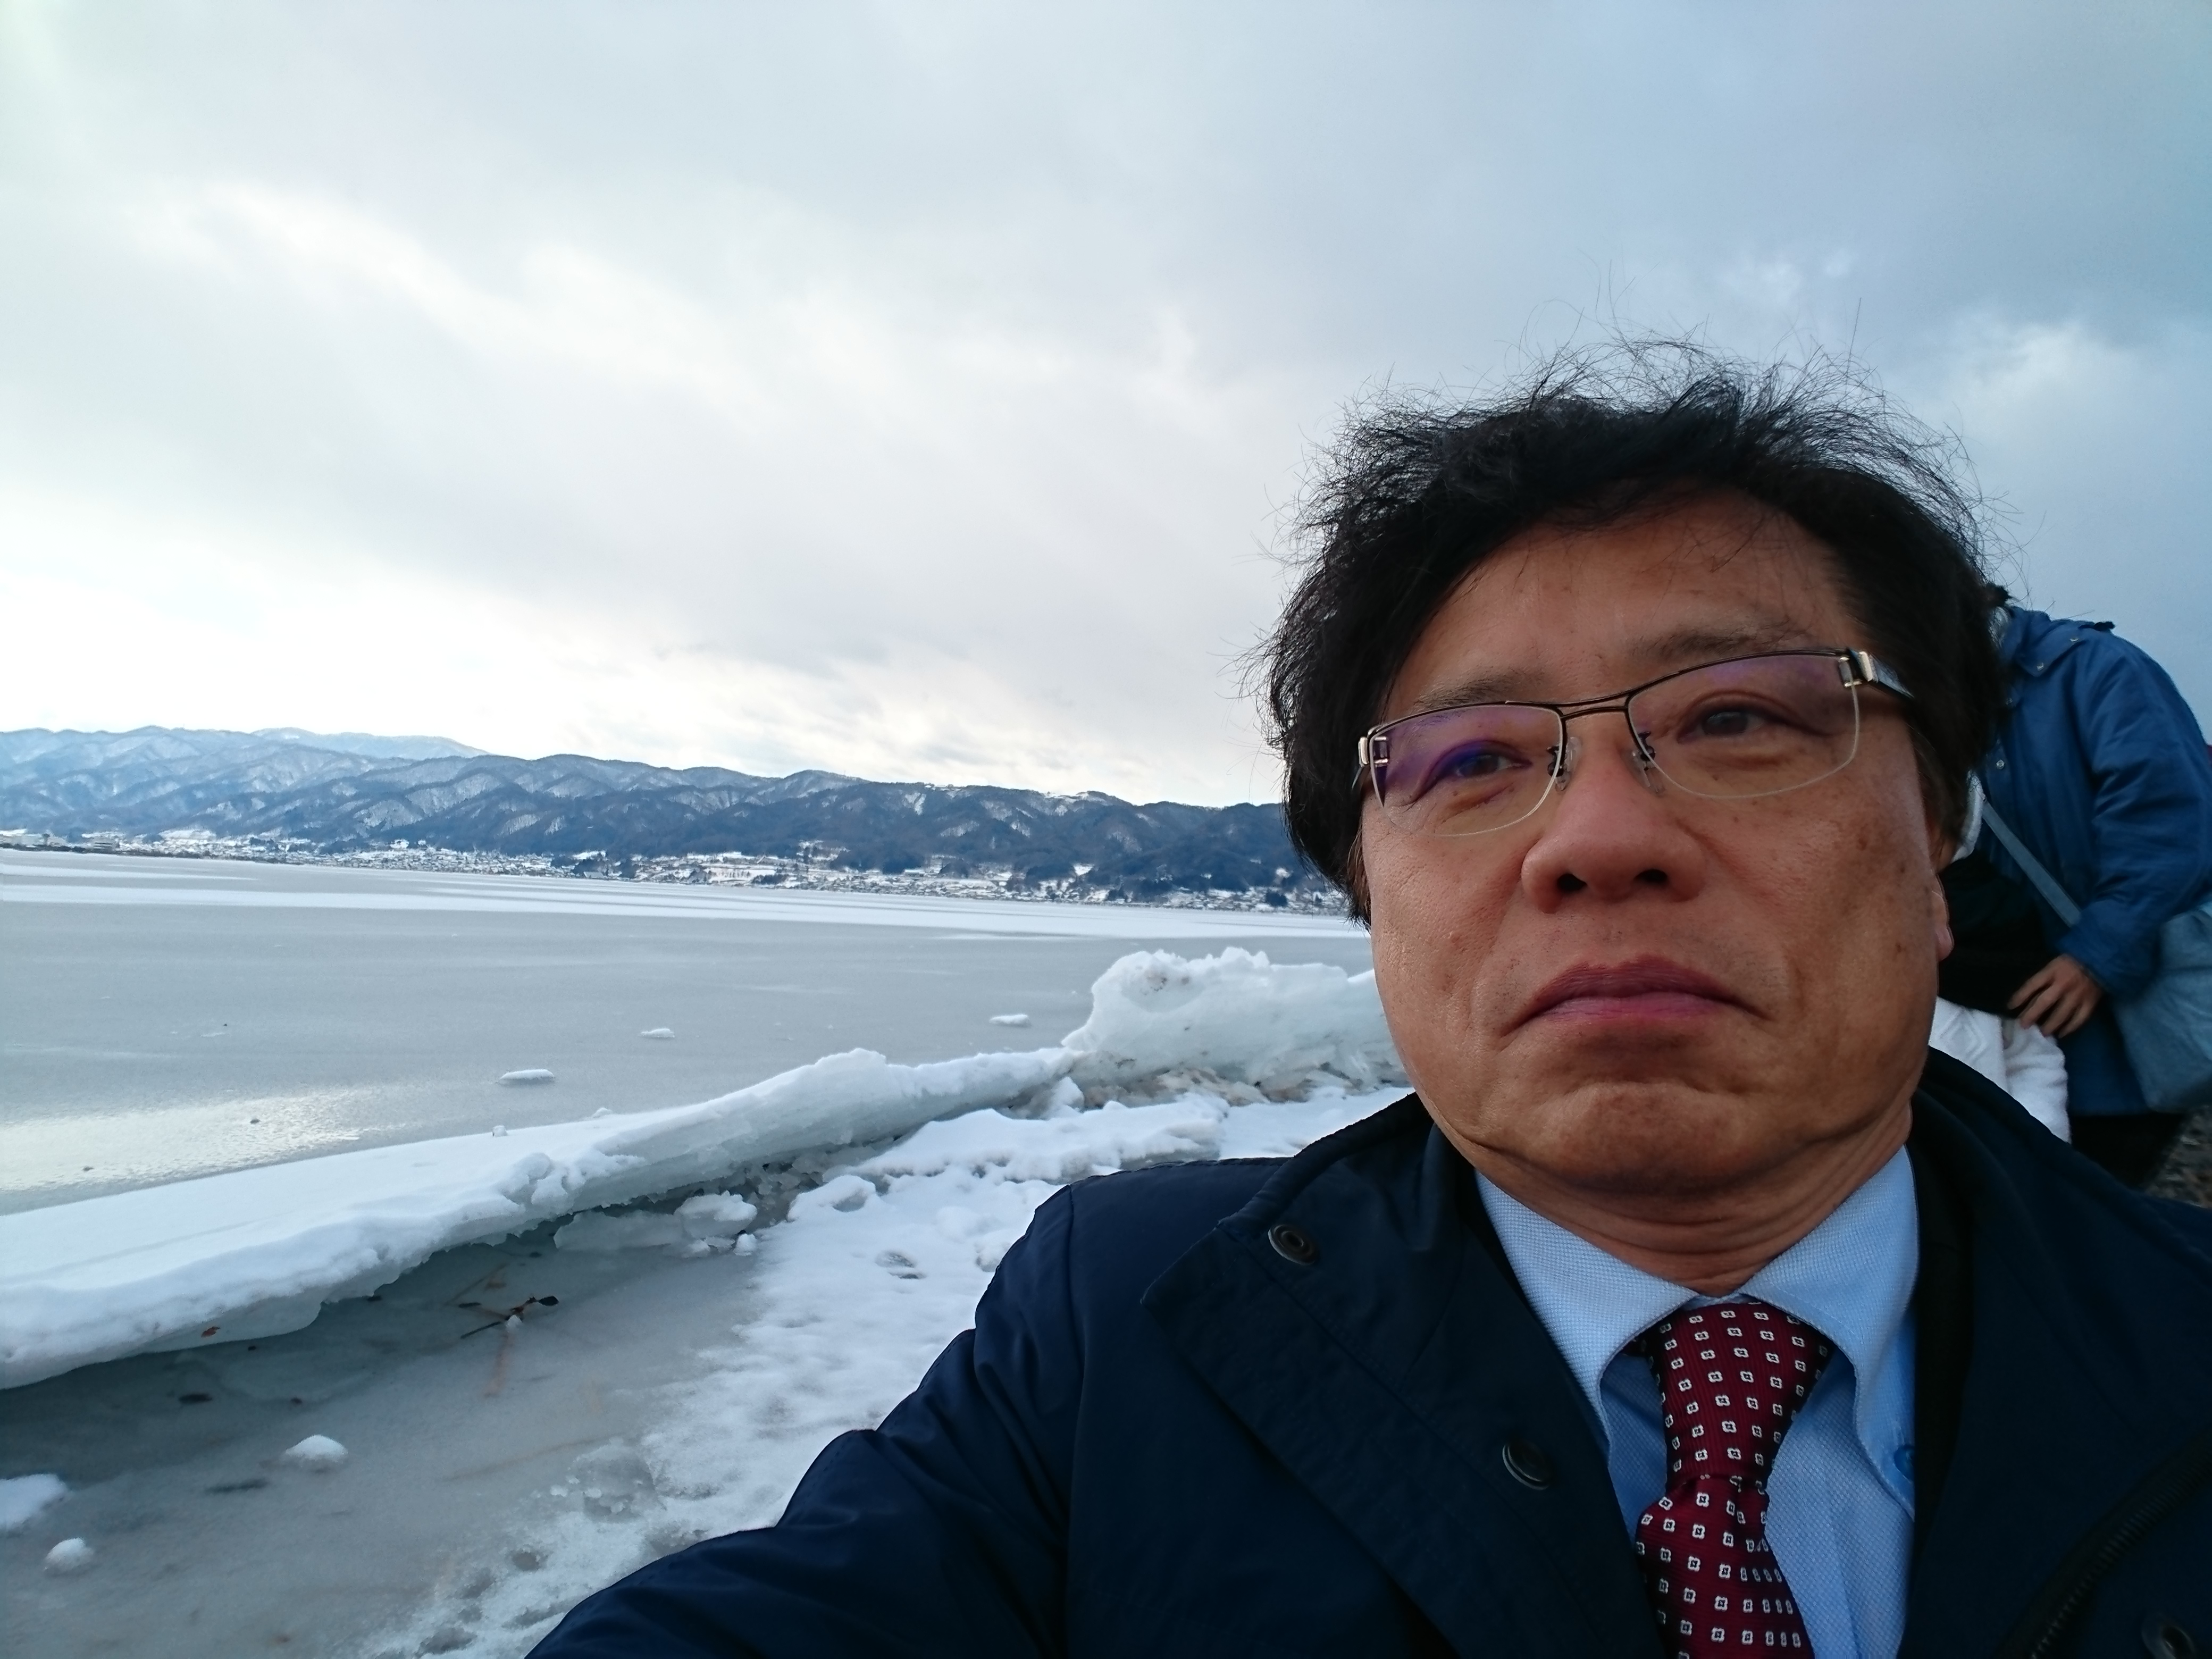 http://www.inoue-satoshi.com/diary/DSC_0681.JPG